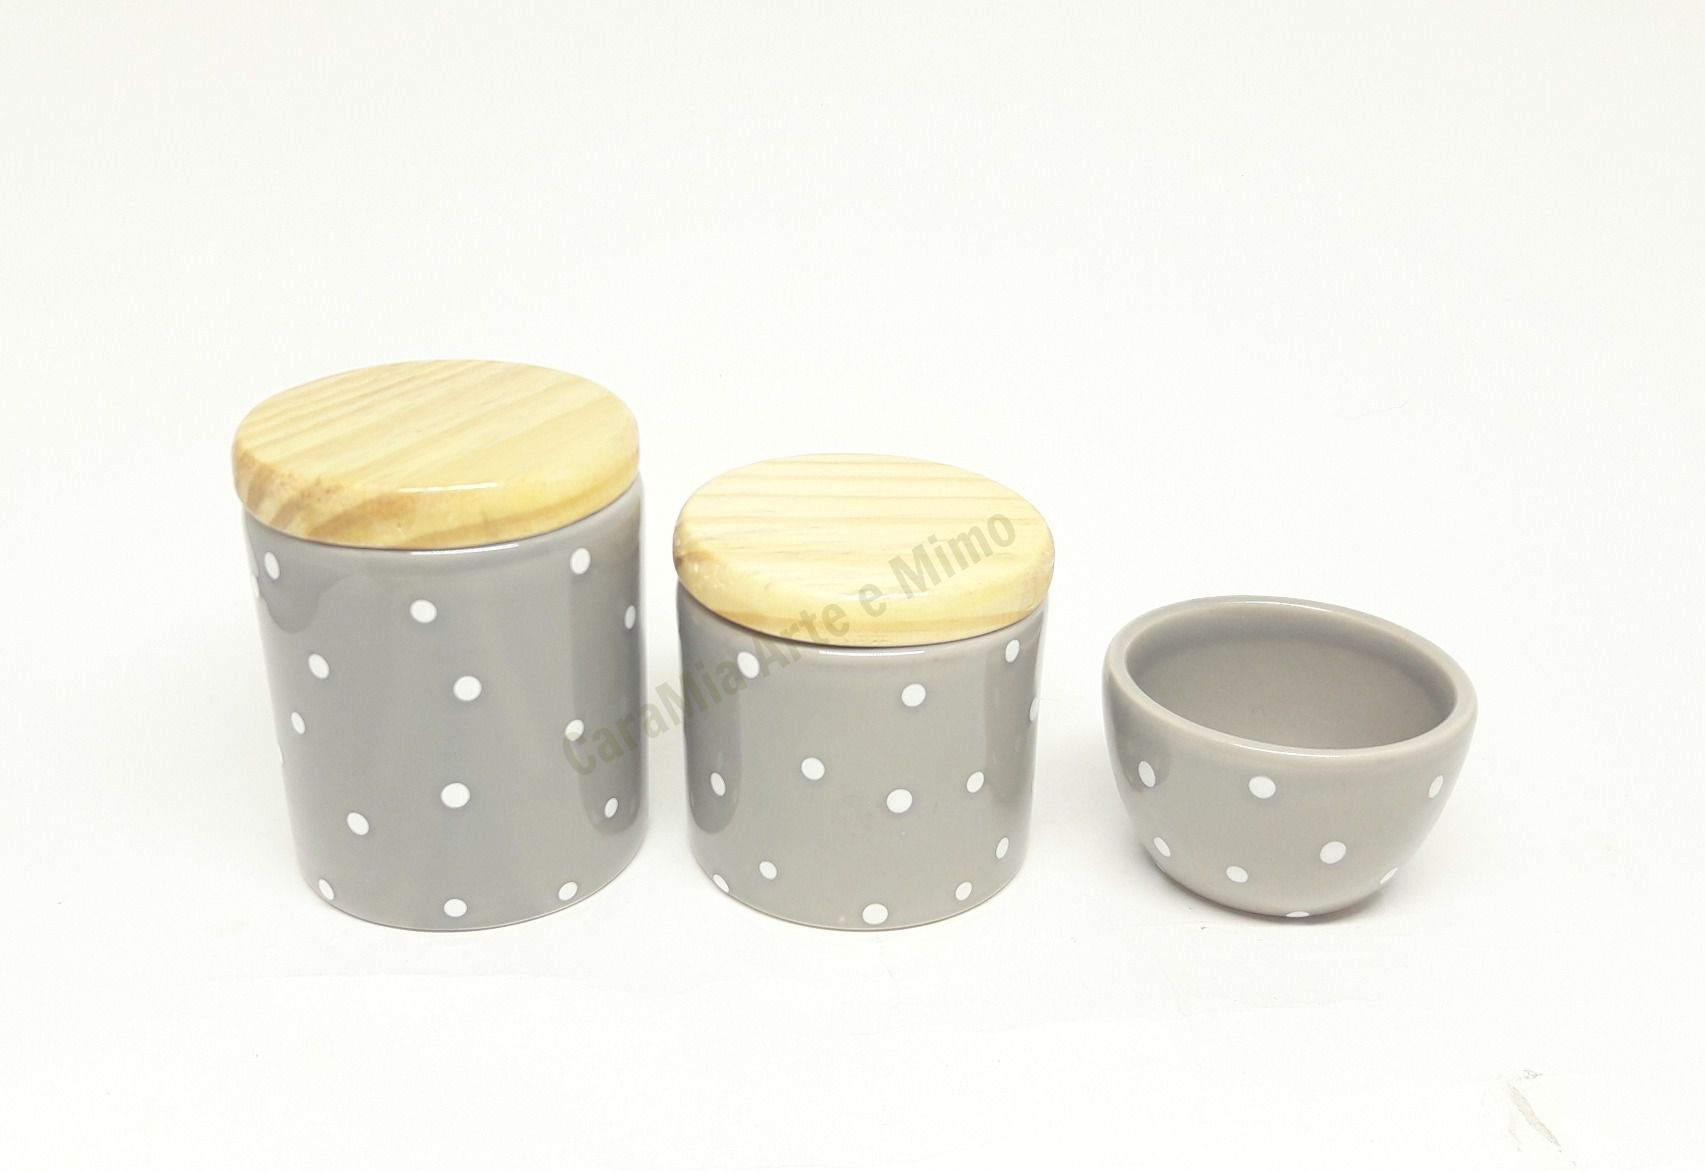 Kit Higiene Bebê Cerâmica | Cinza com Poá Branco| Tampas Madeira Pinus